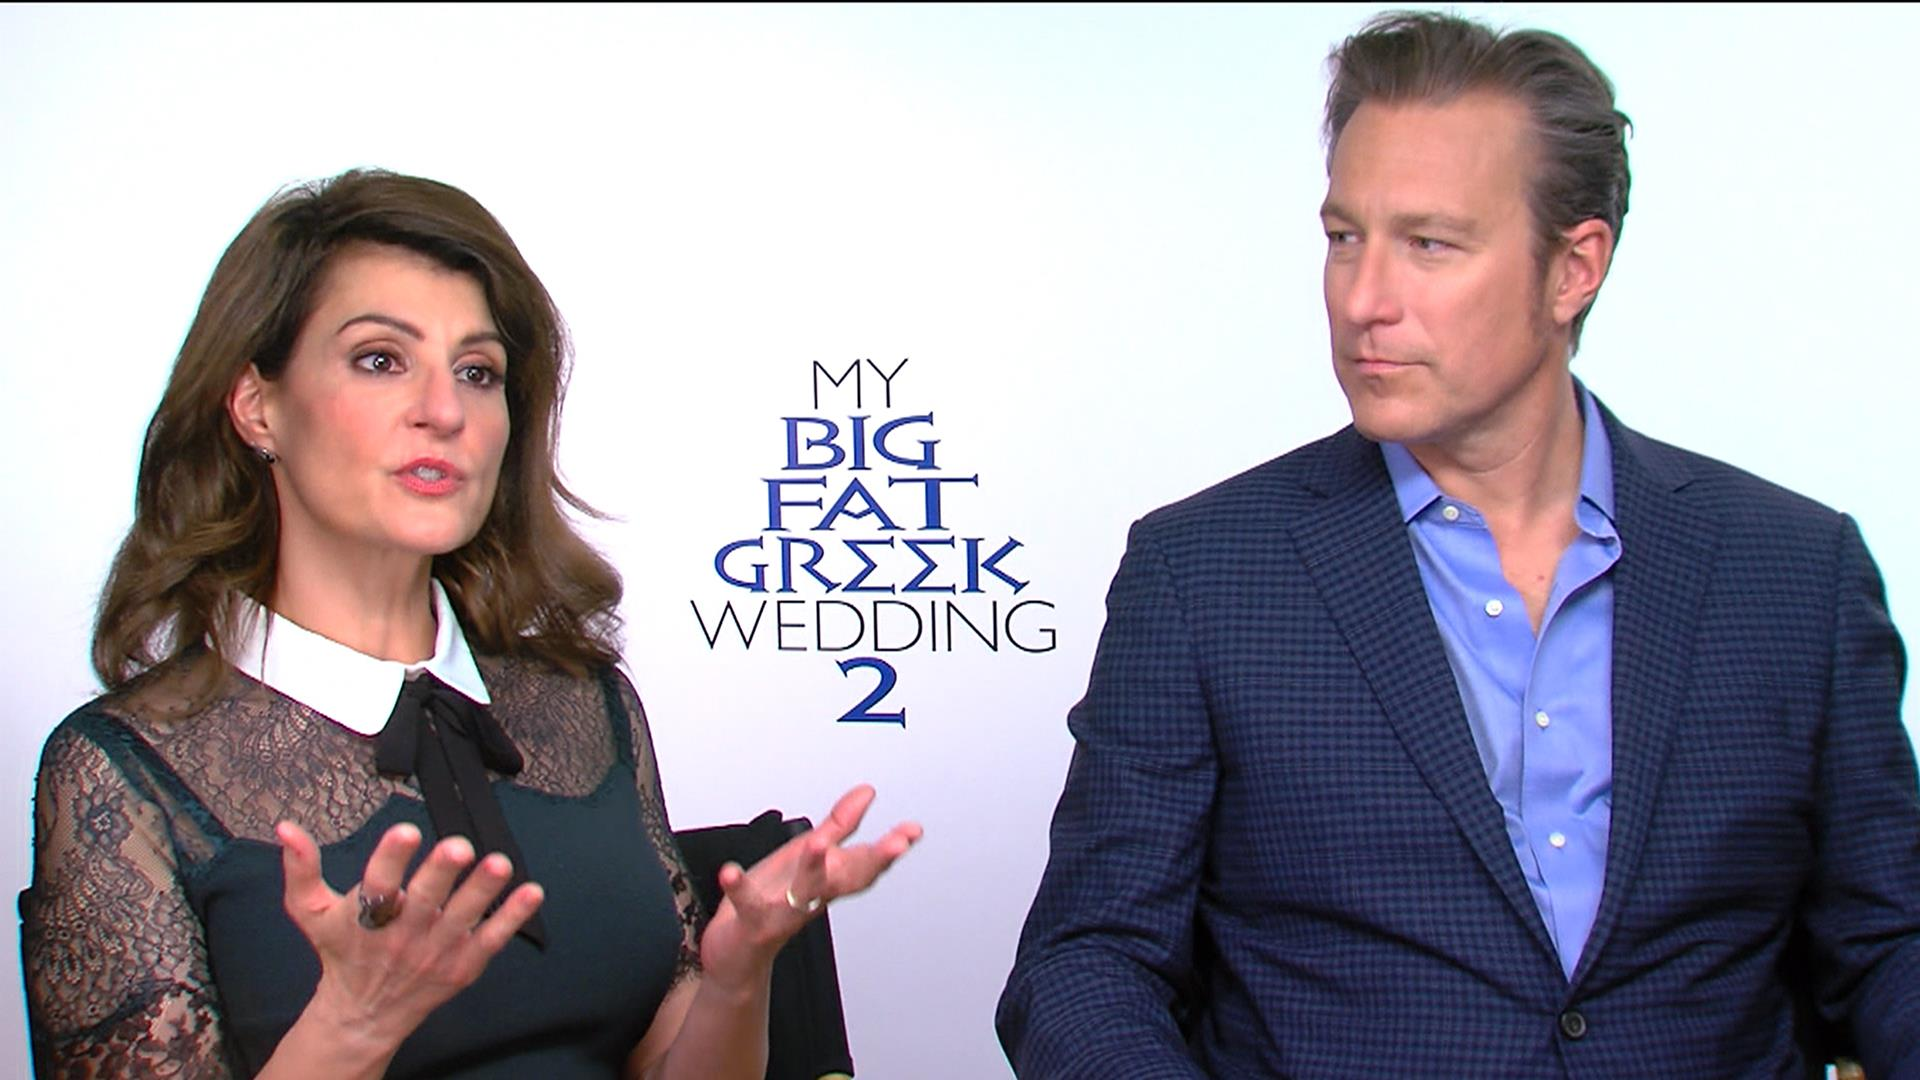 My Fat Greek Wedding 2 Cast Sits Down With Today Nbc News